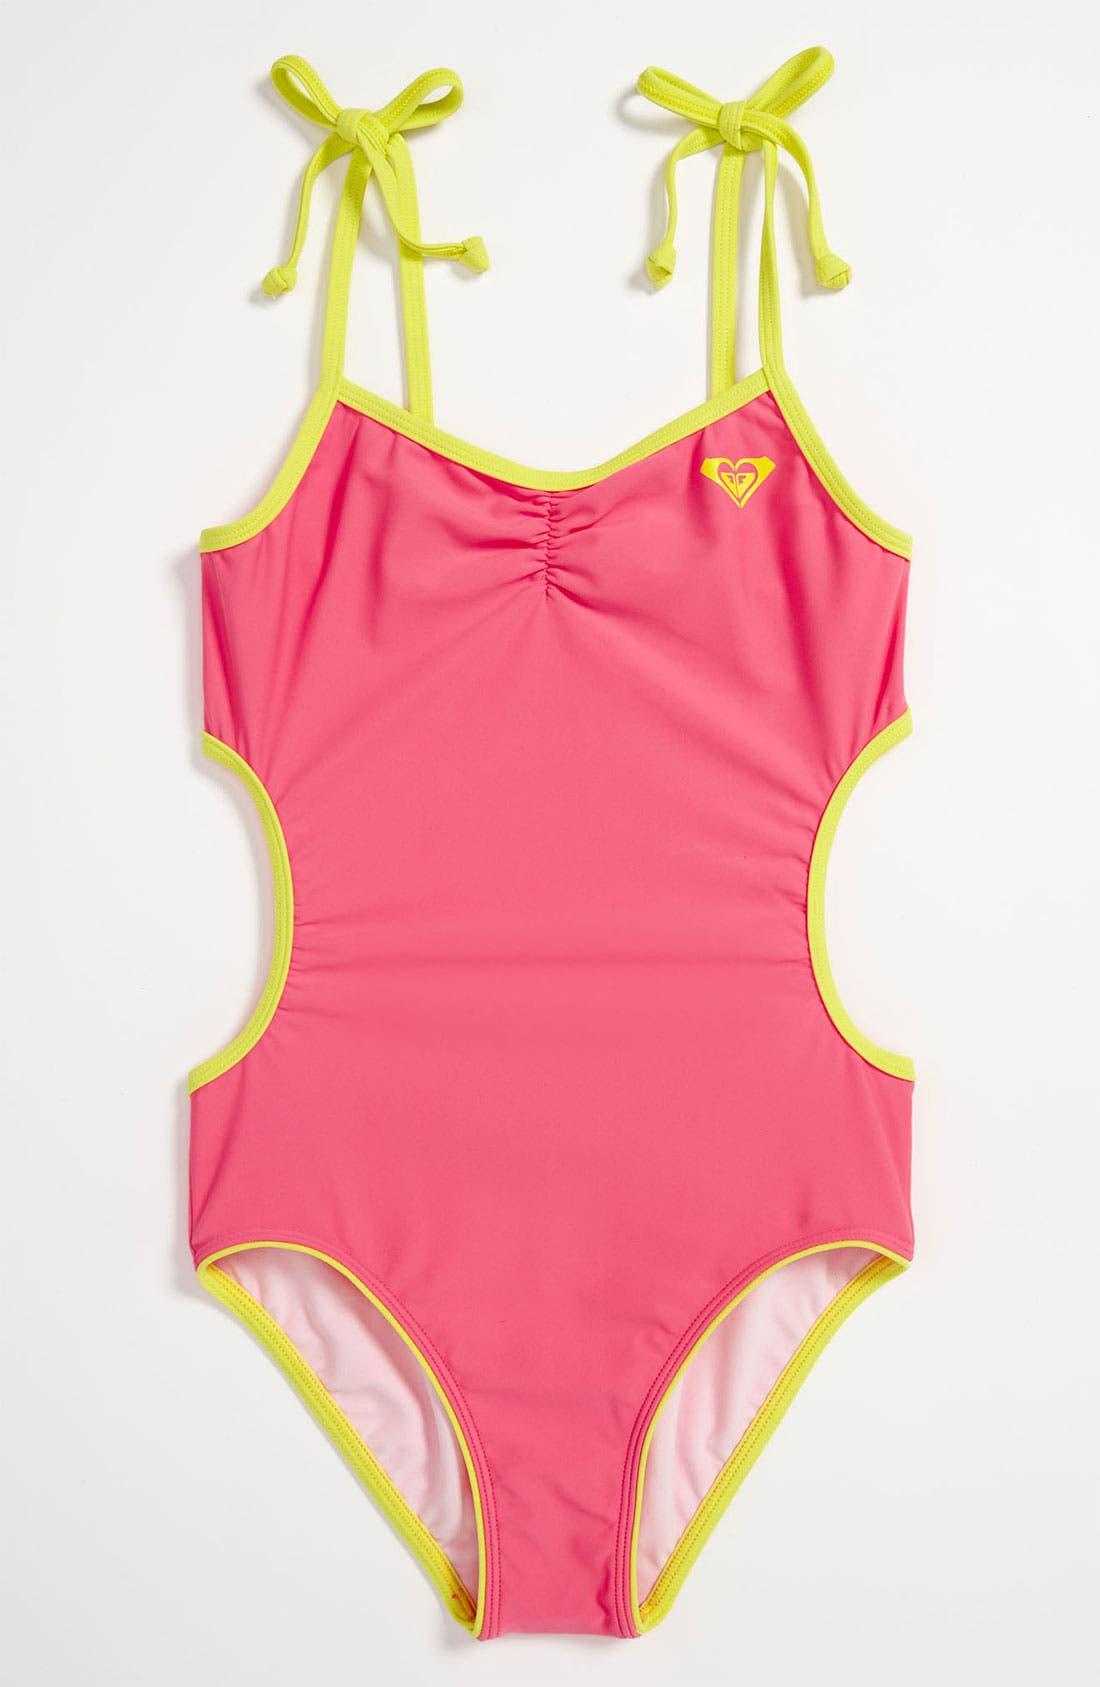 Main Image - Roxy One Piece Swimsuit (Big Girls)